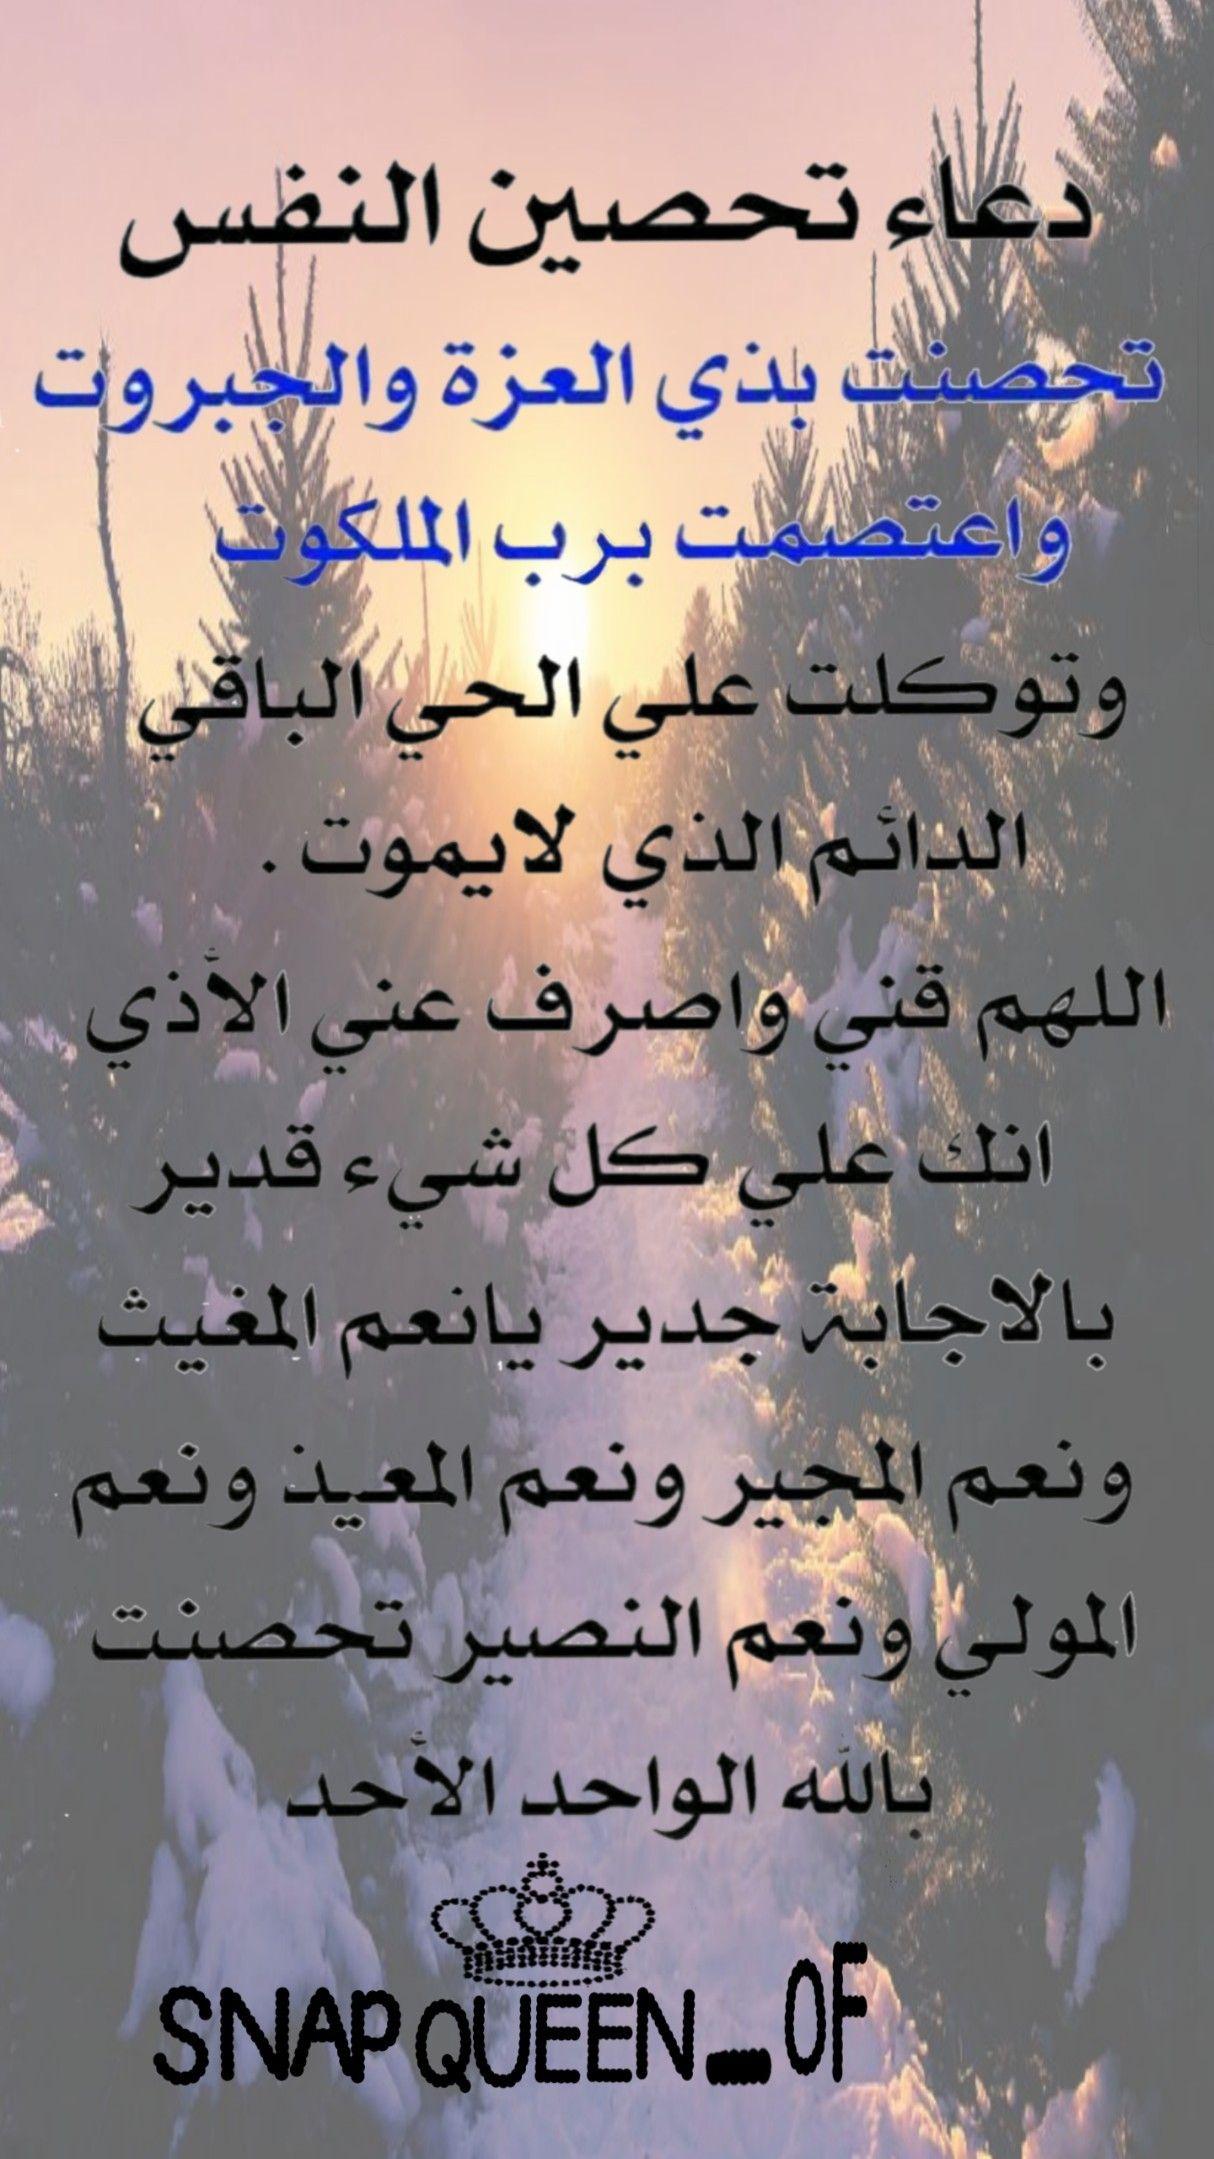 Pin By سيده الذوق On سناب شات سنابي تابعوني Arabic Calligraphy Calligraphy Arabic